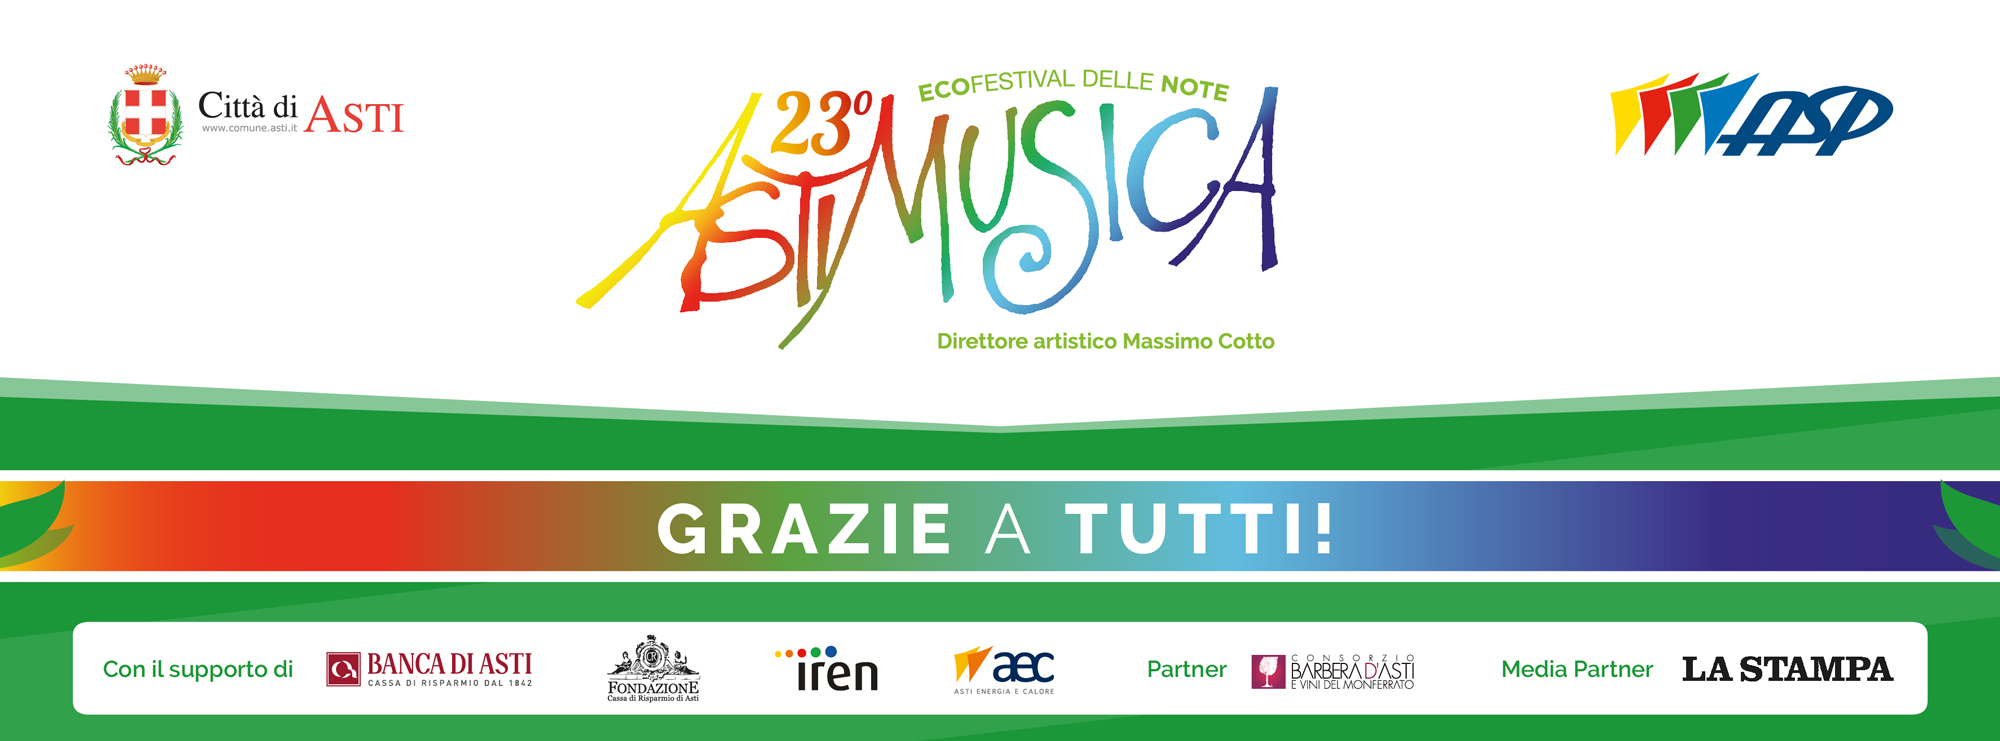 Astimusica2018-grazie